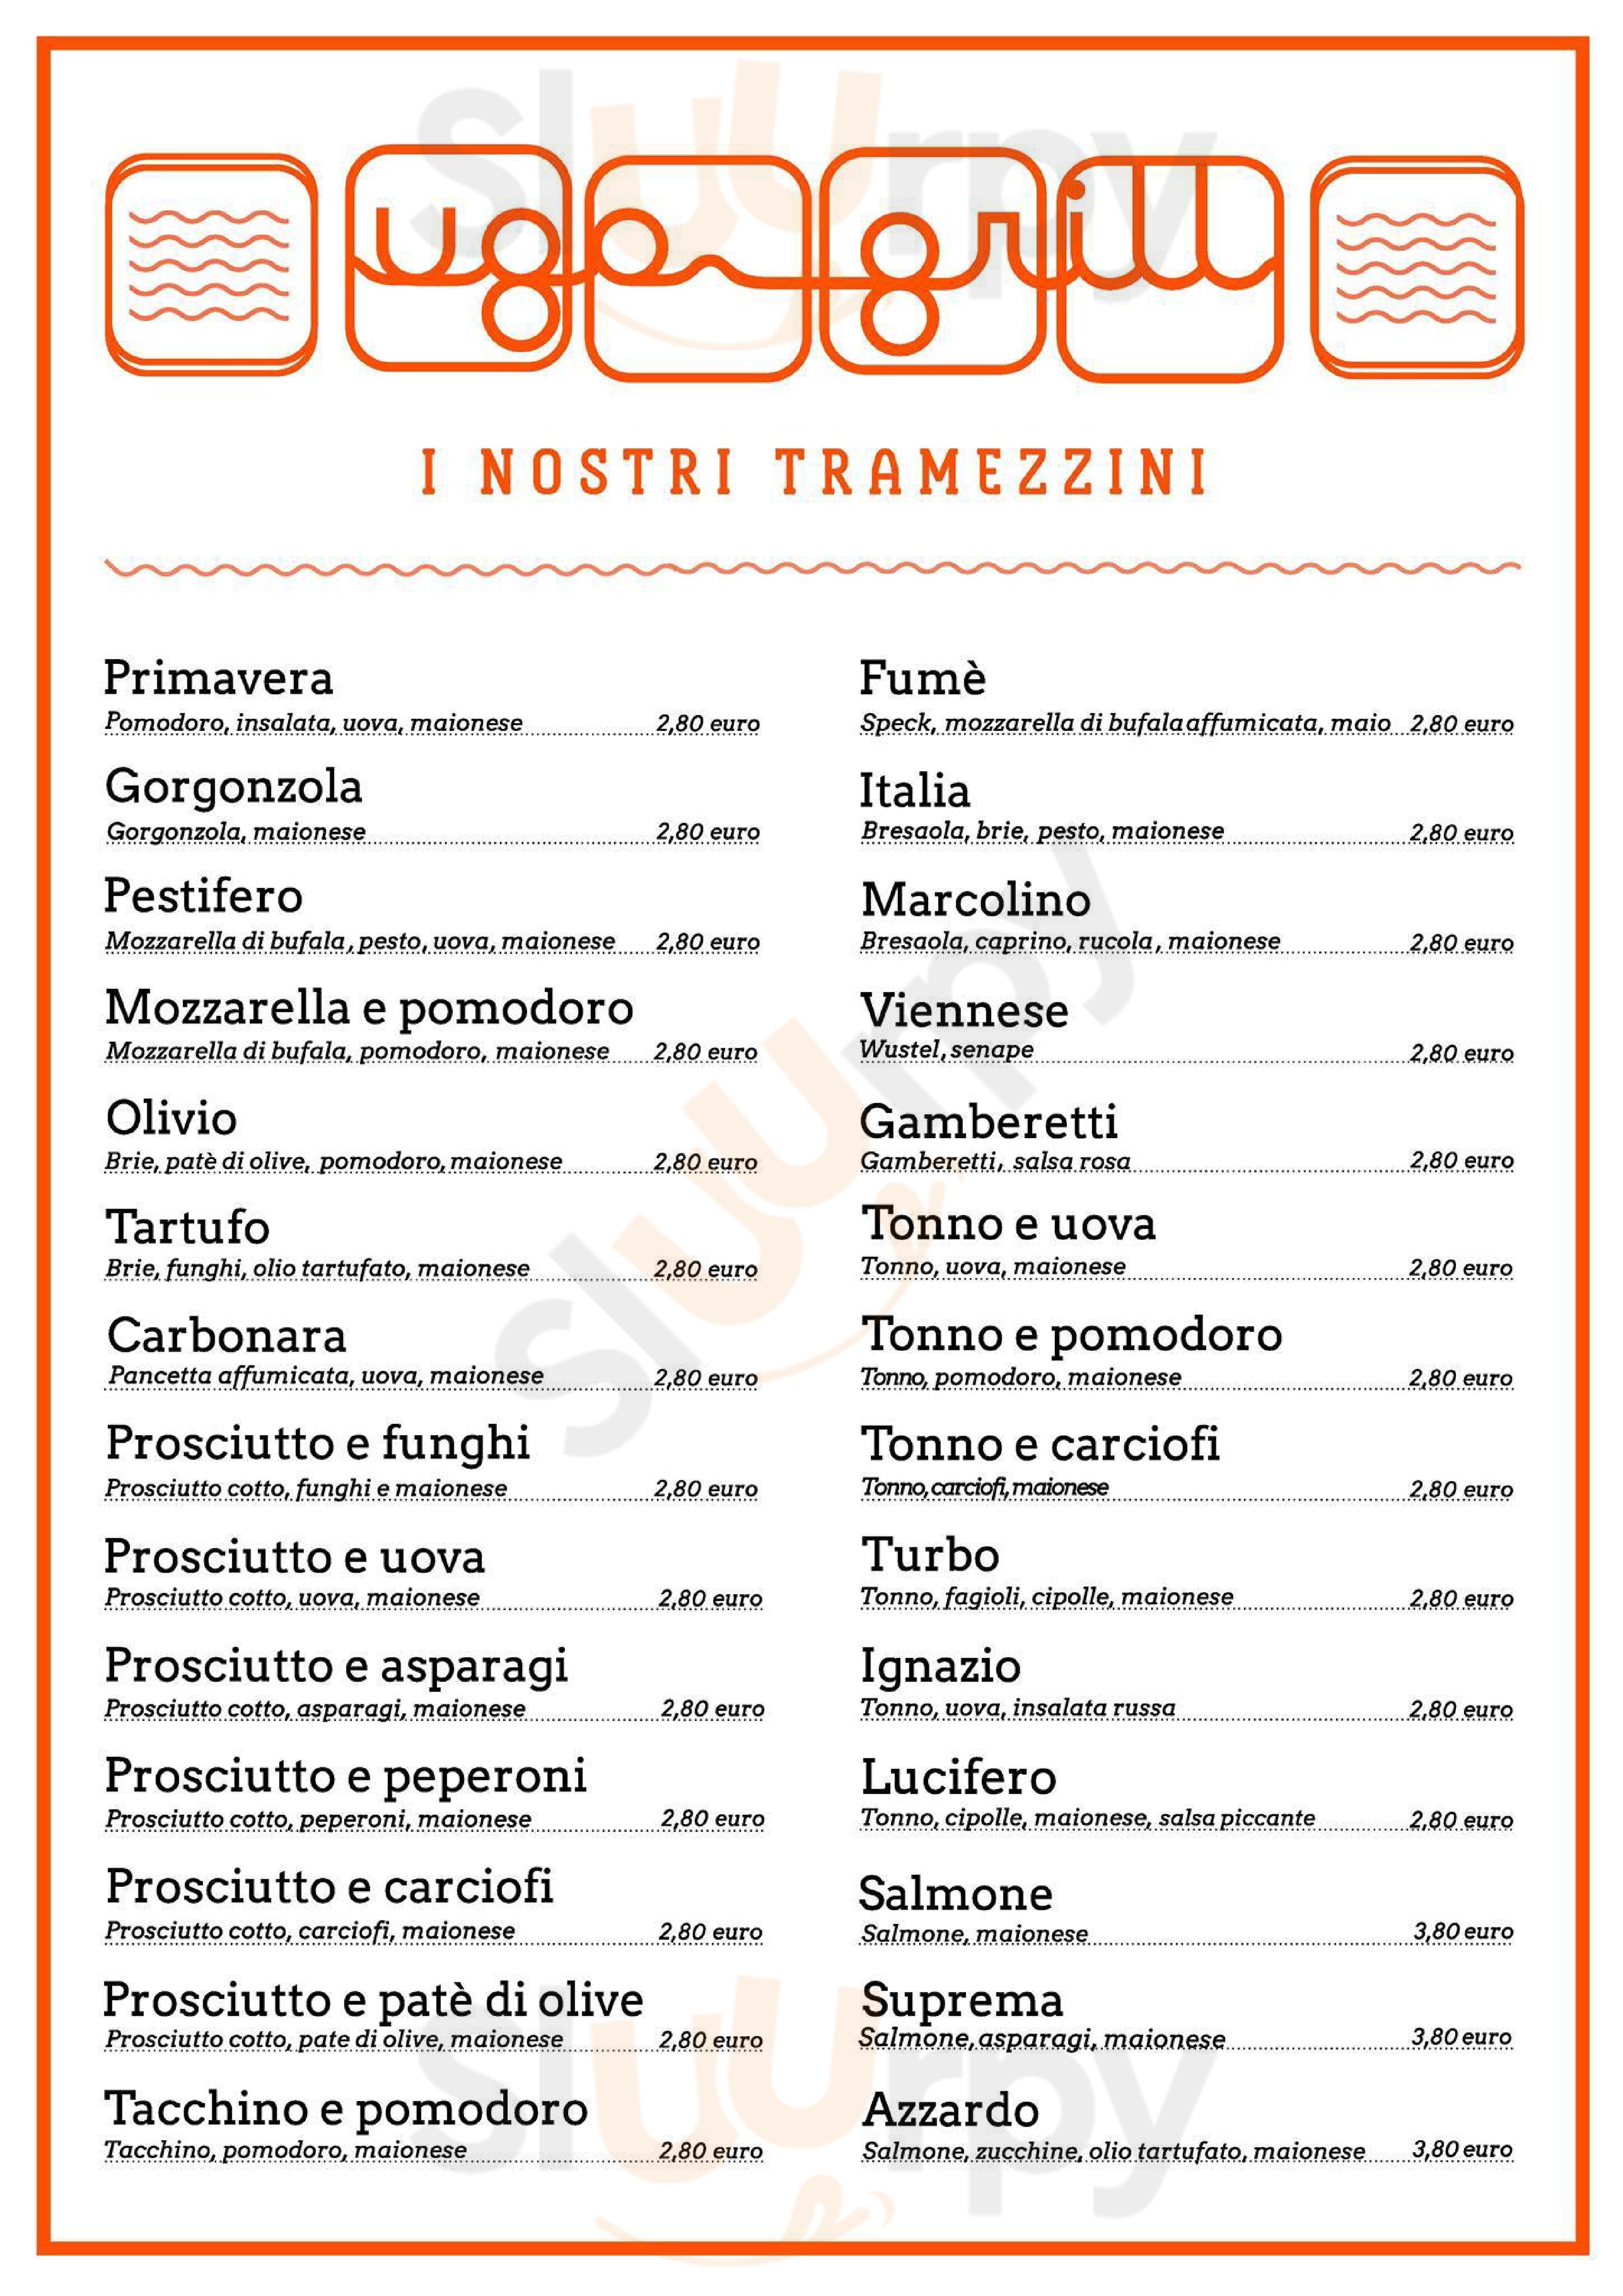 Ugo Grill Cremona menù 1 pagina